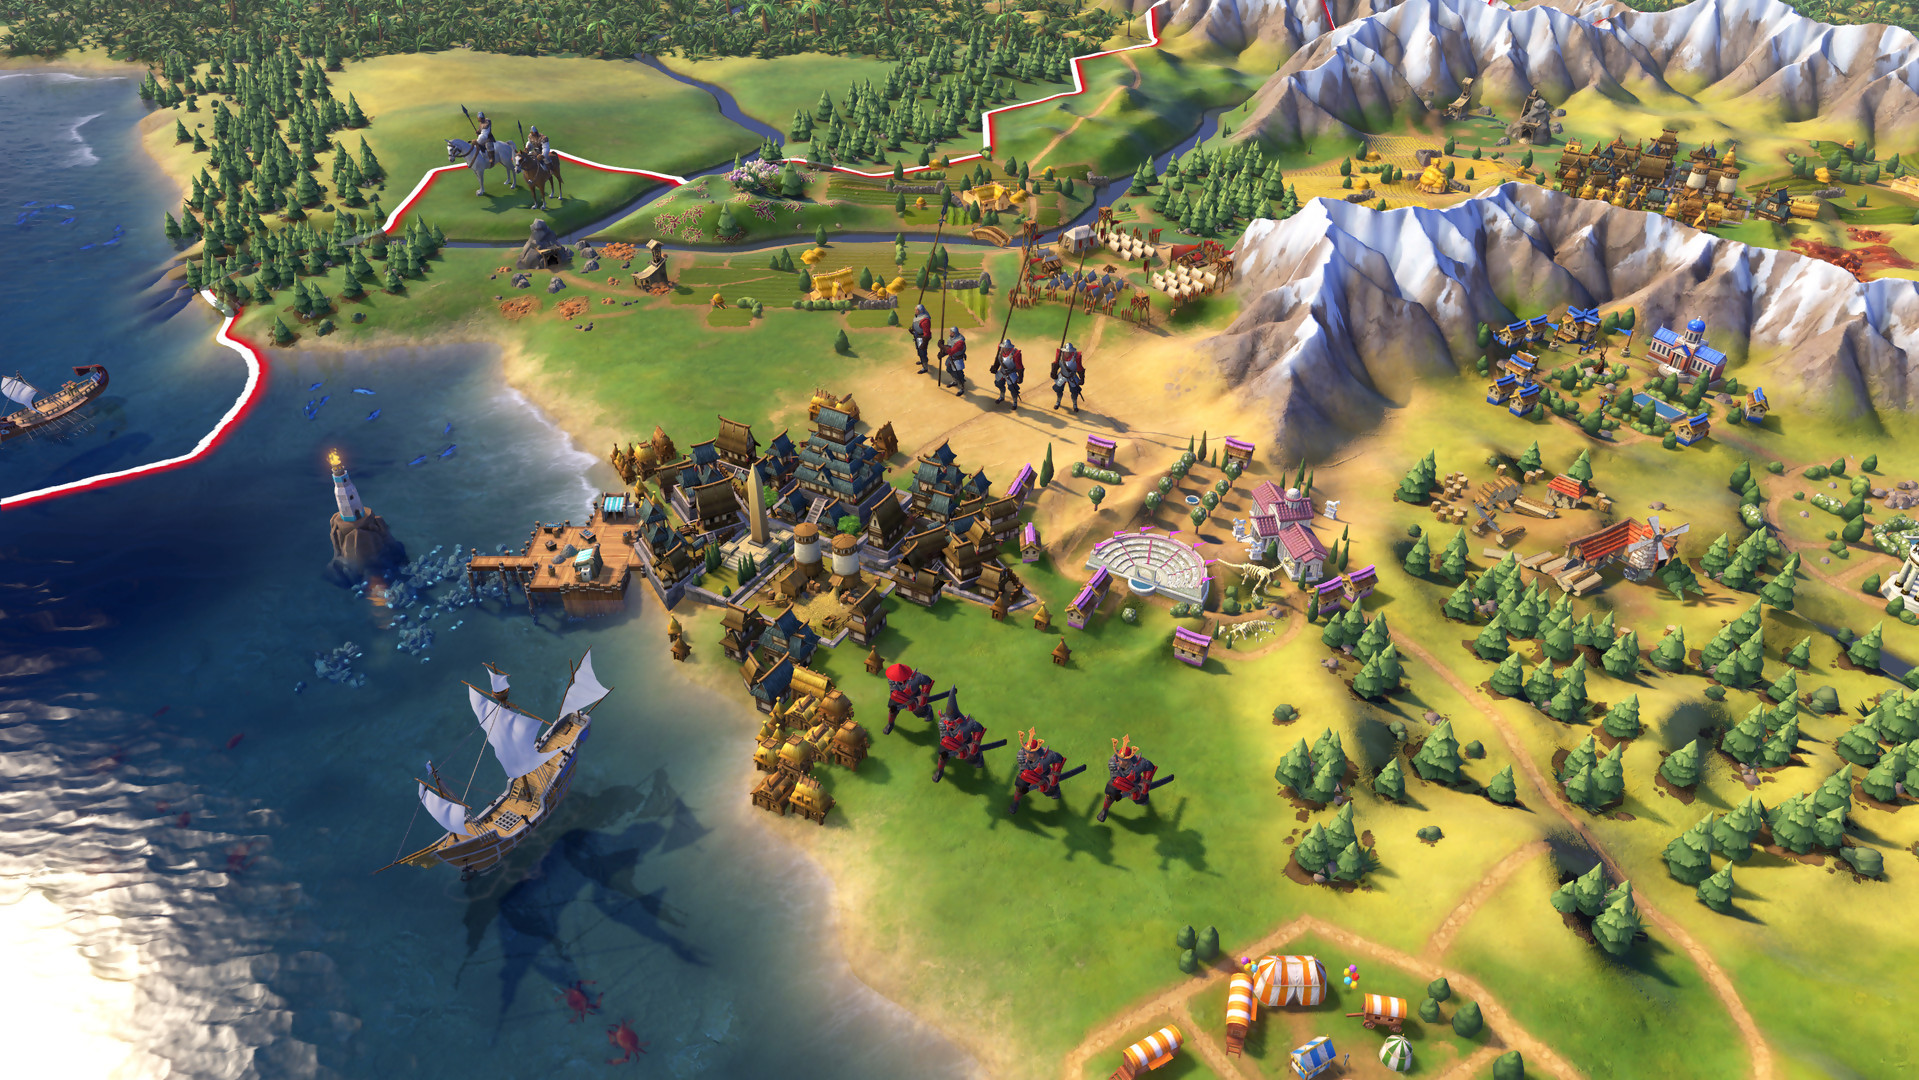 http://i.jeuxactus.com/datas/jeux/s/i/sid-meiers-civilization-vi/xl/sid-meiers-civilizatio-57340b2d4a70f.jpg